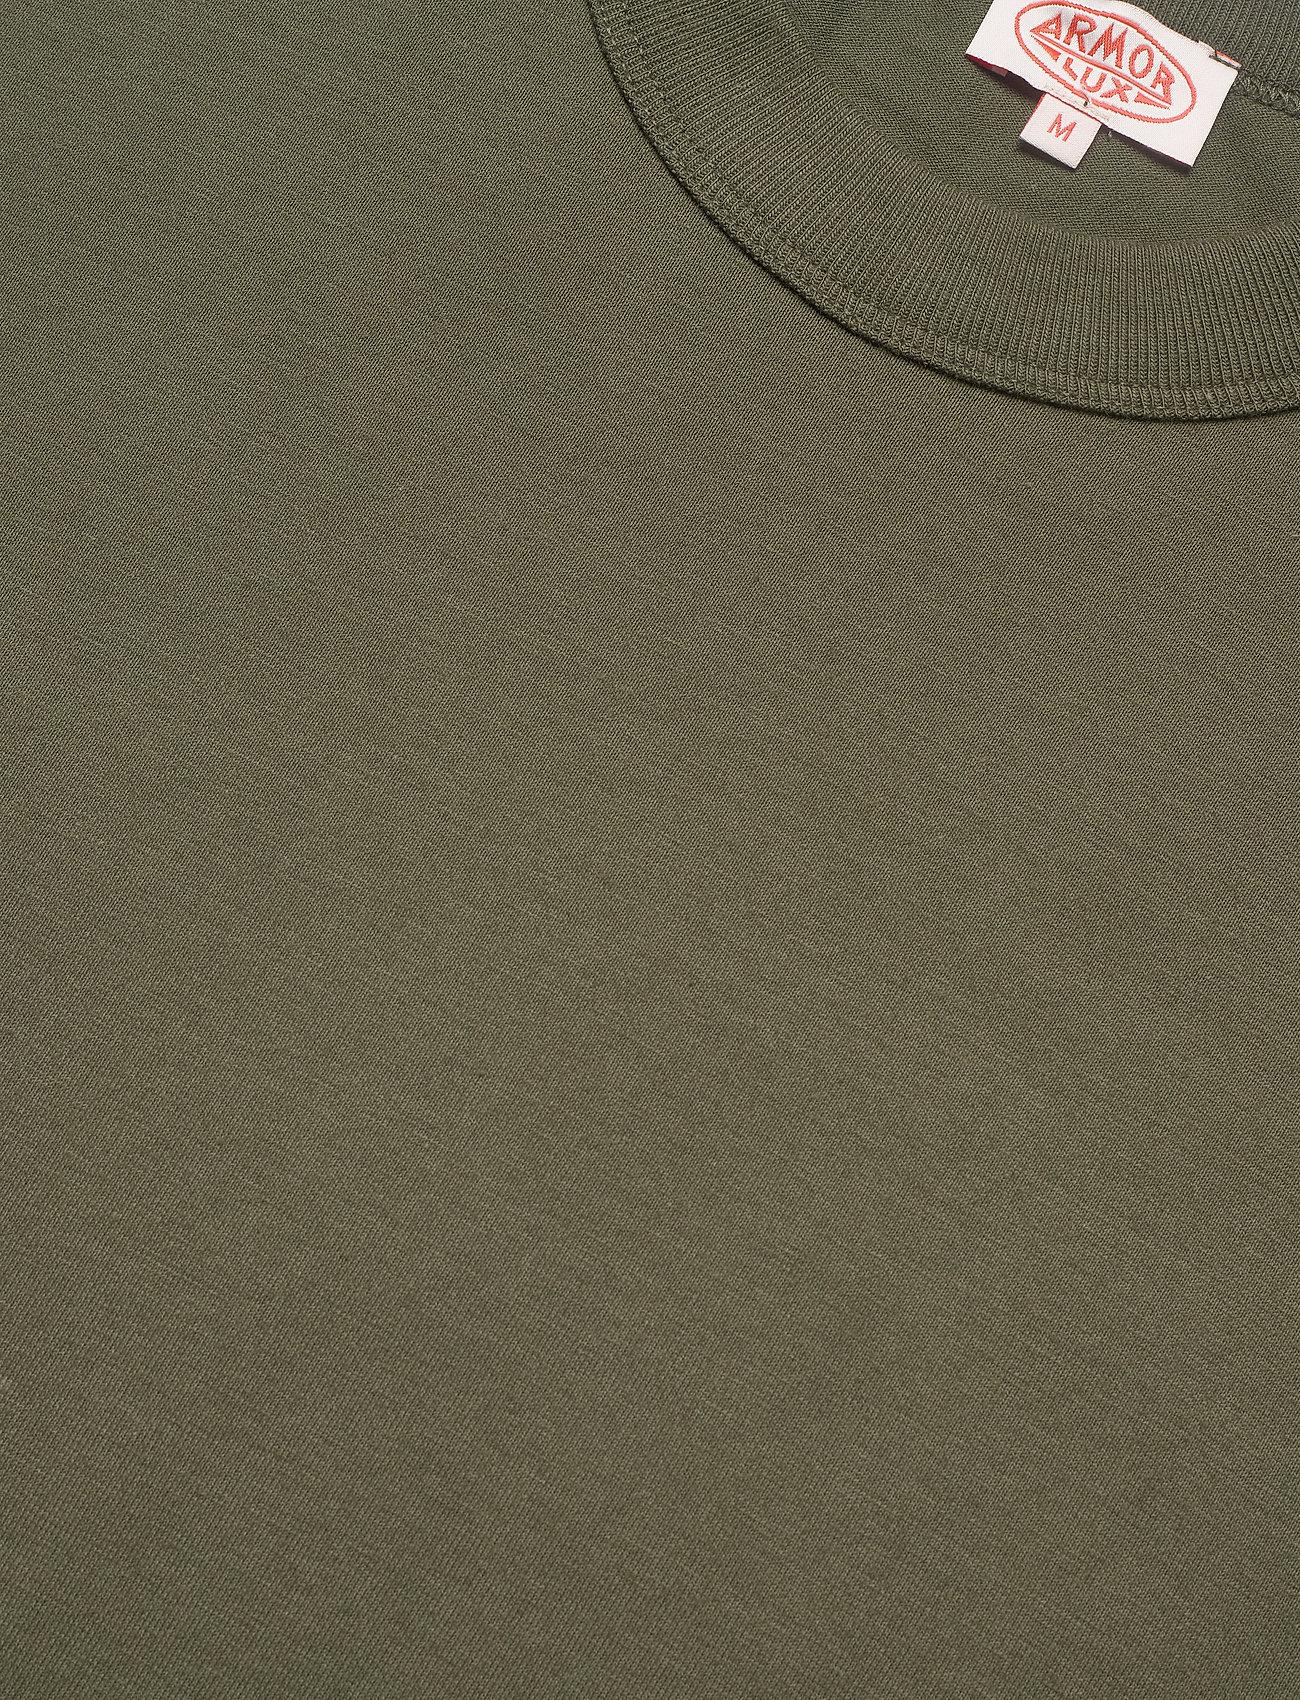 Armor Lux Round Neck T-Shirt - T-skjorter ARMY KHAKI - Menn Klær